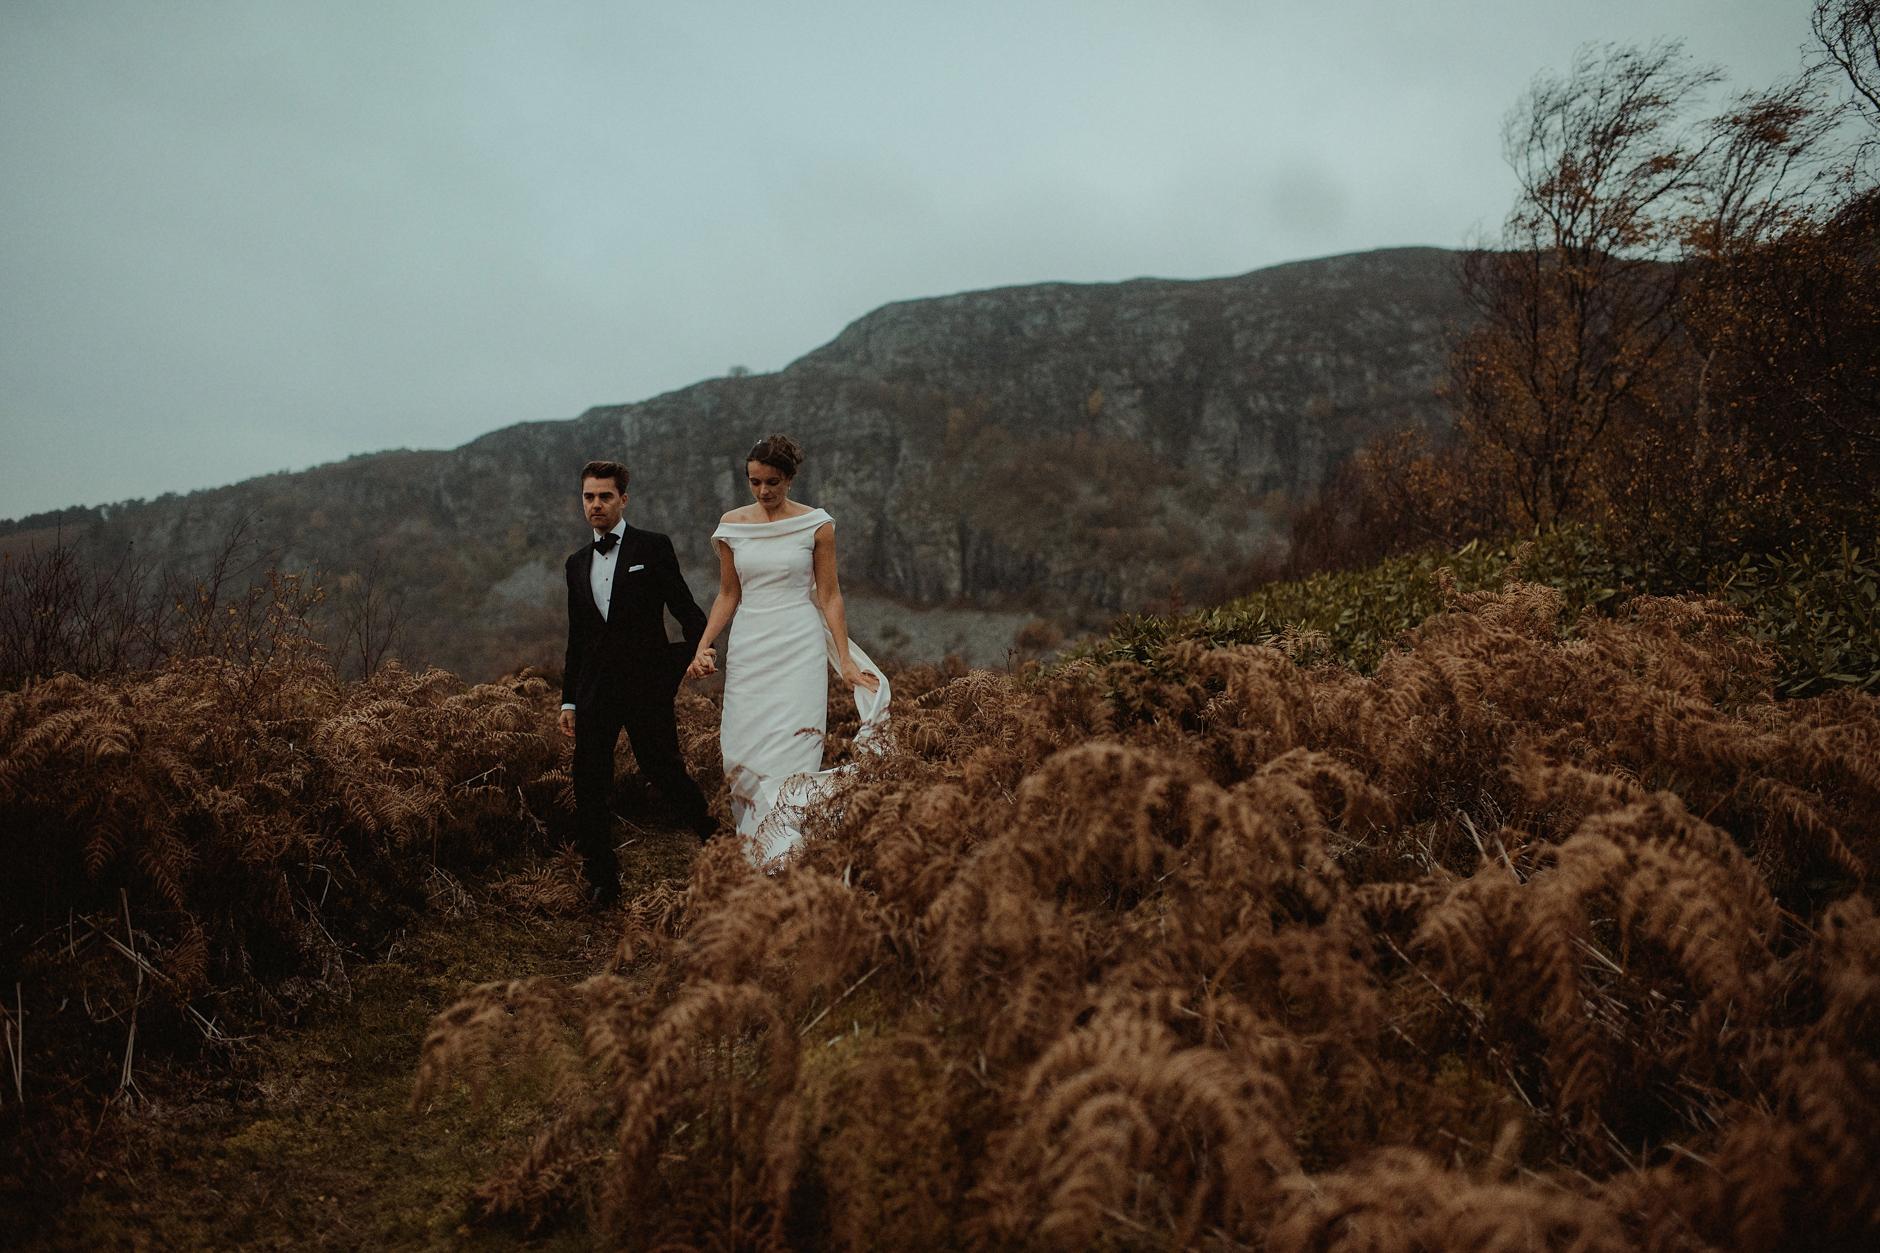 Glentruim-Wedding-Nikki-Leadbetter-Photography-181.jpg